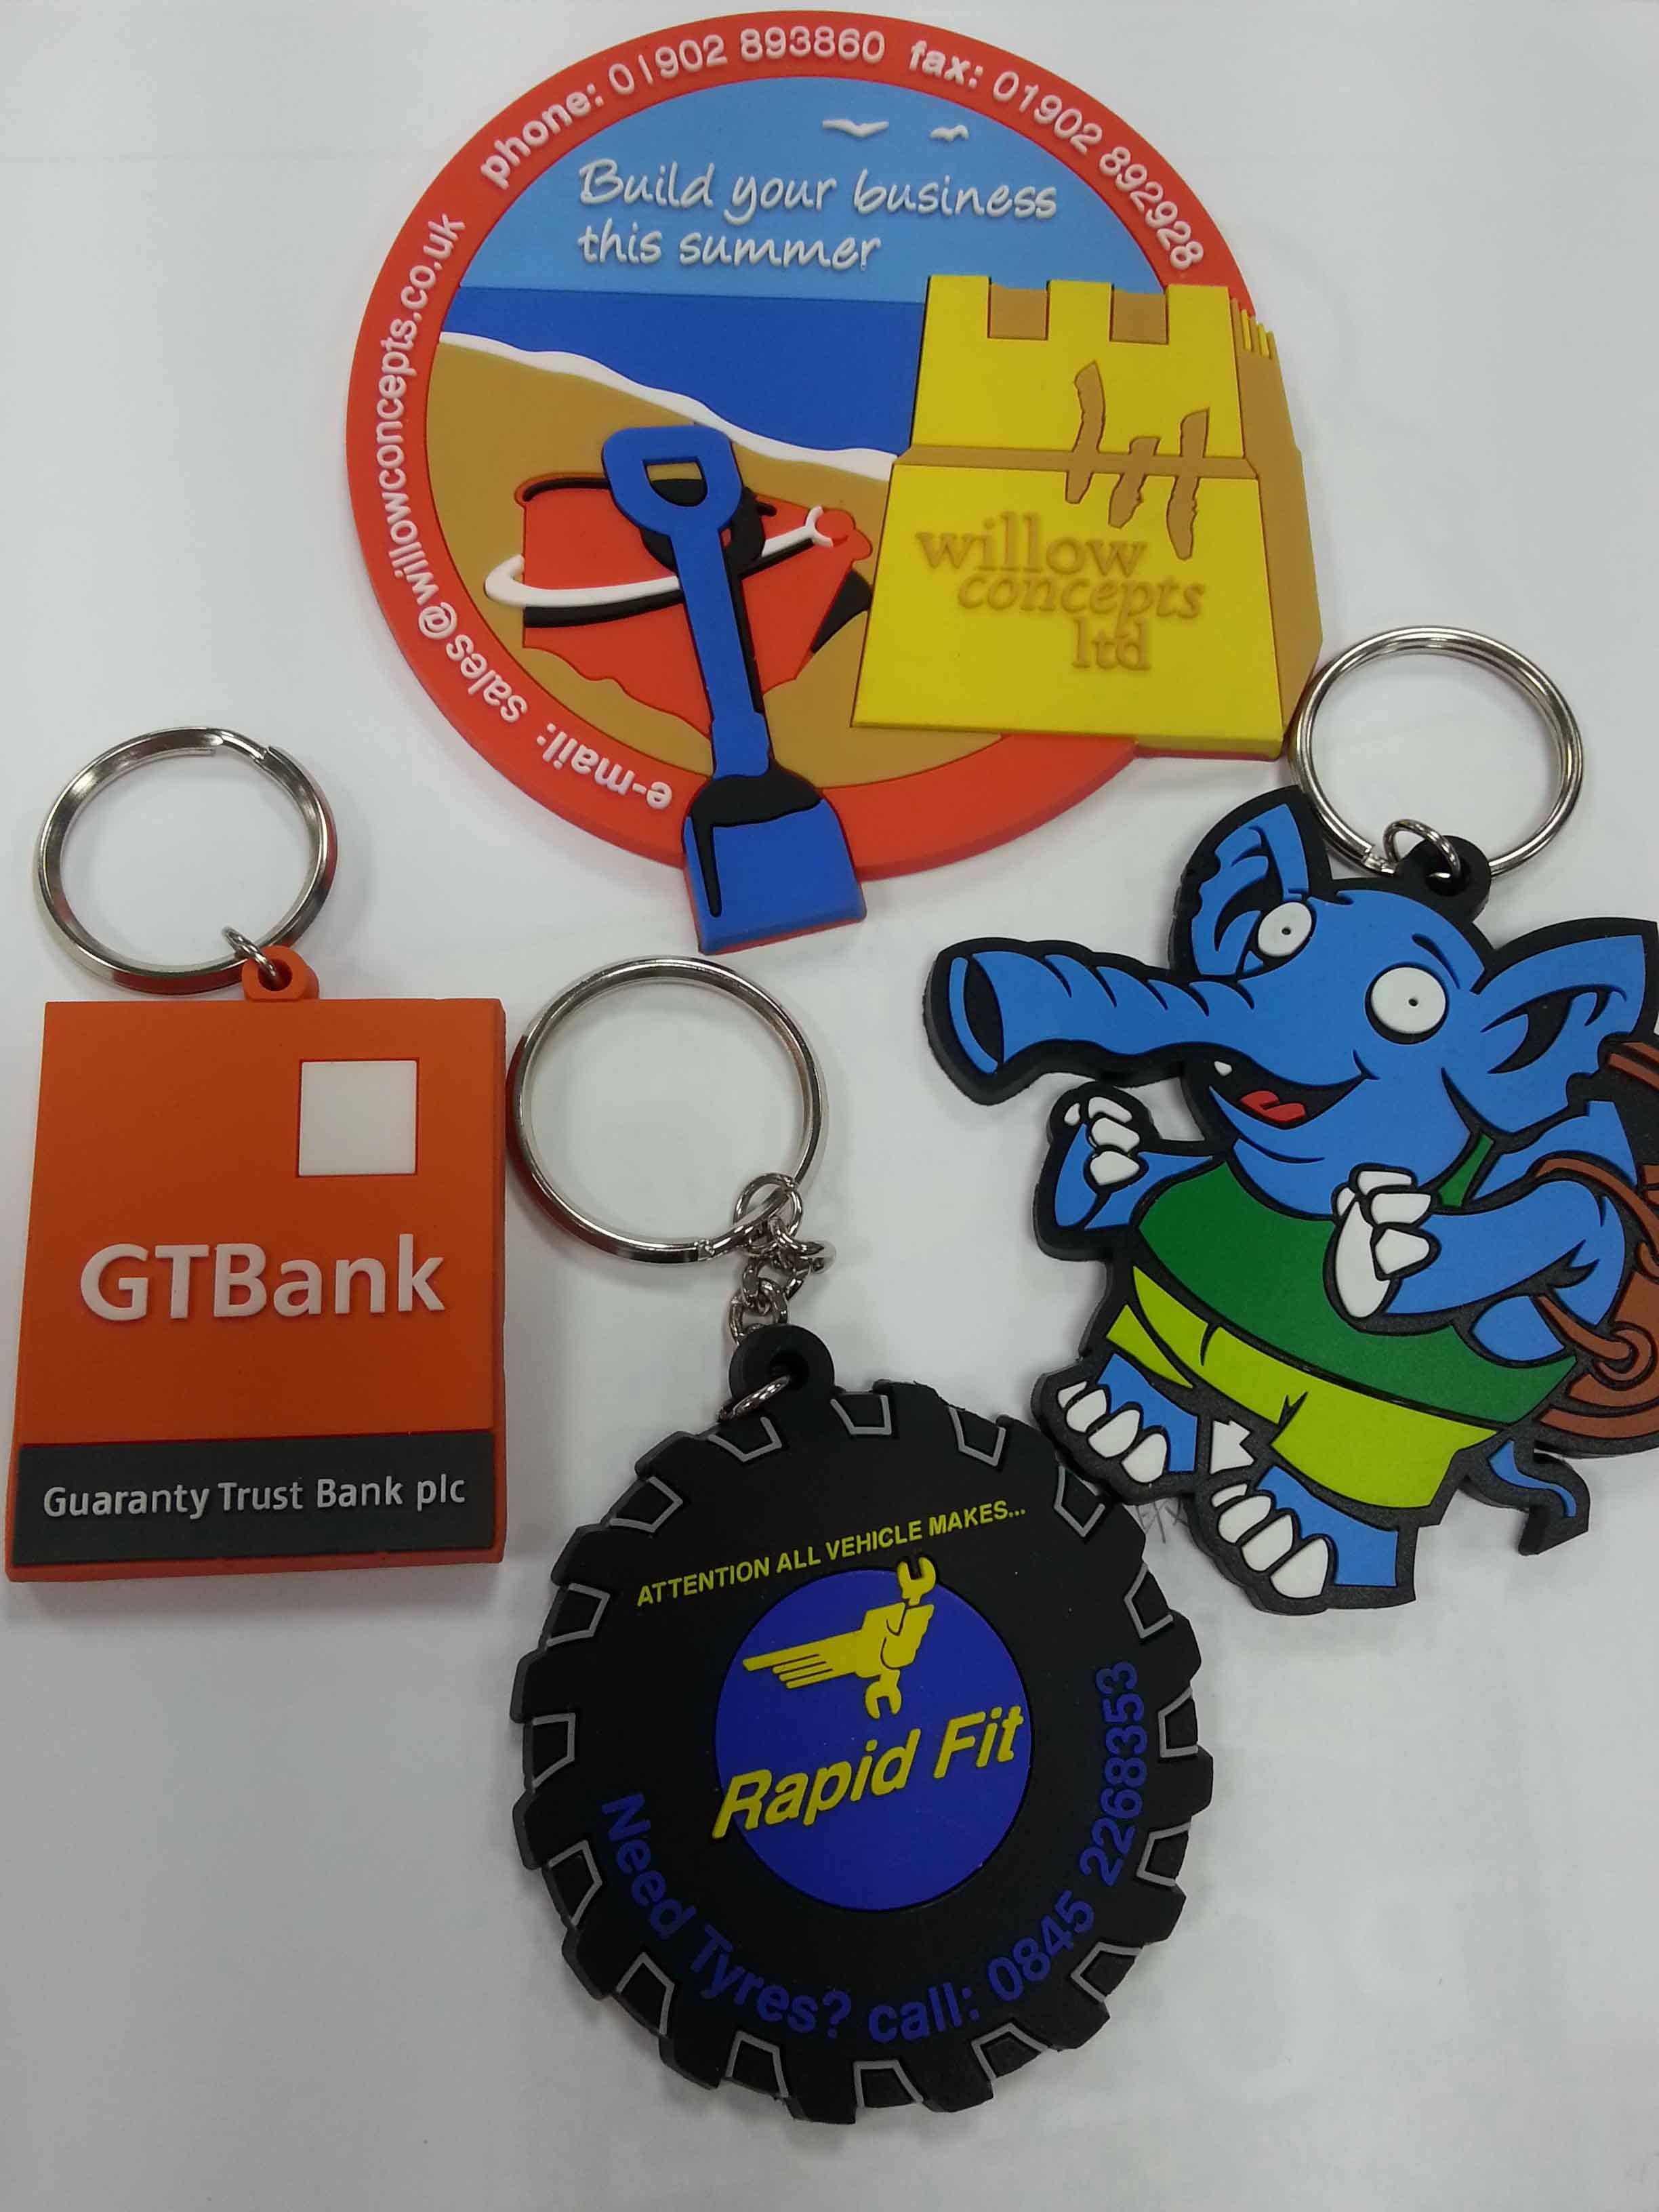 Soft PVC Product, PVC Key Ring, Luggage Tag, Zipper Pull, Dog Tag, Wrist Band, Slap Band